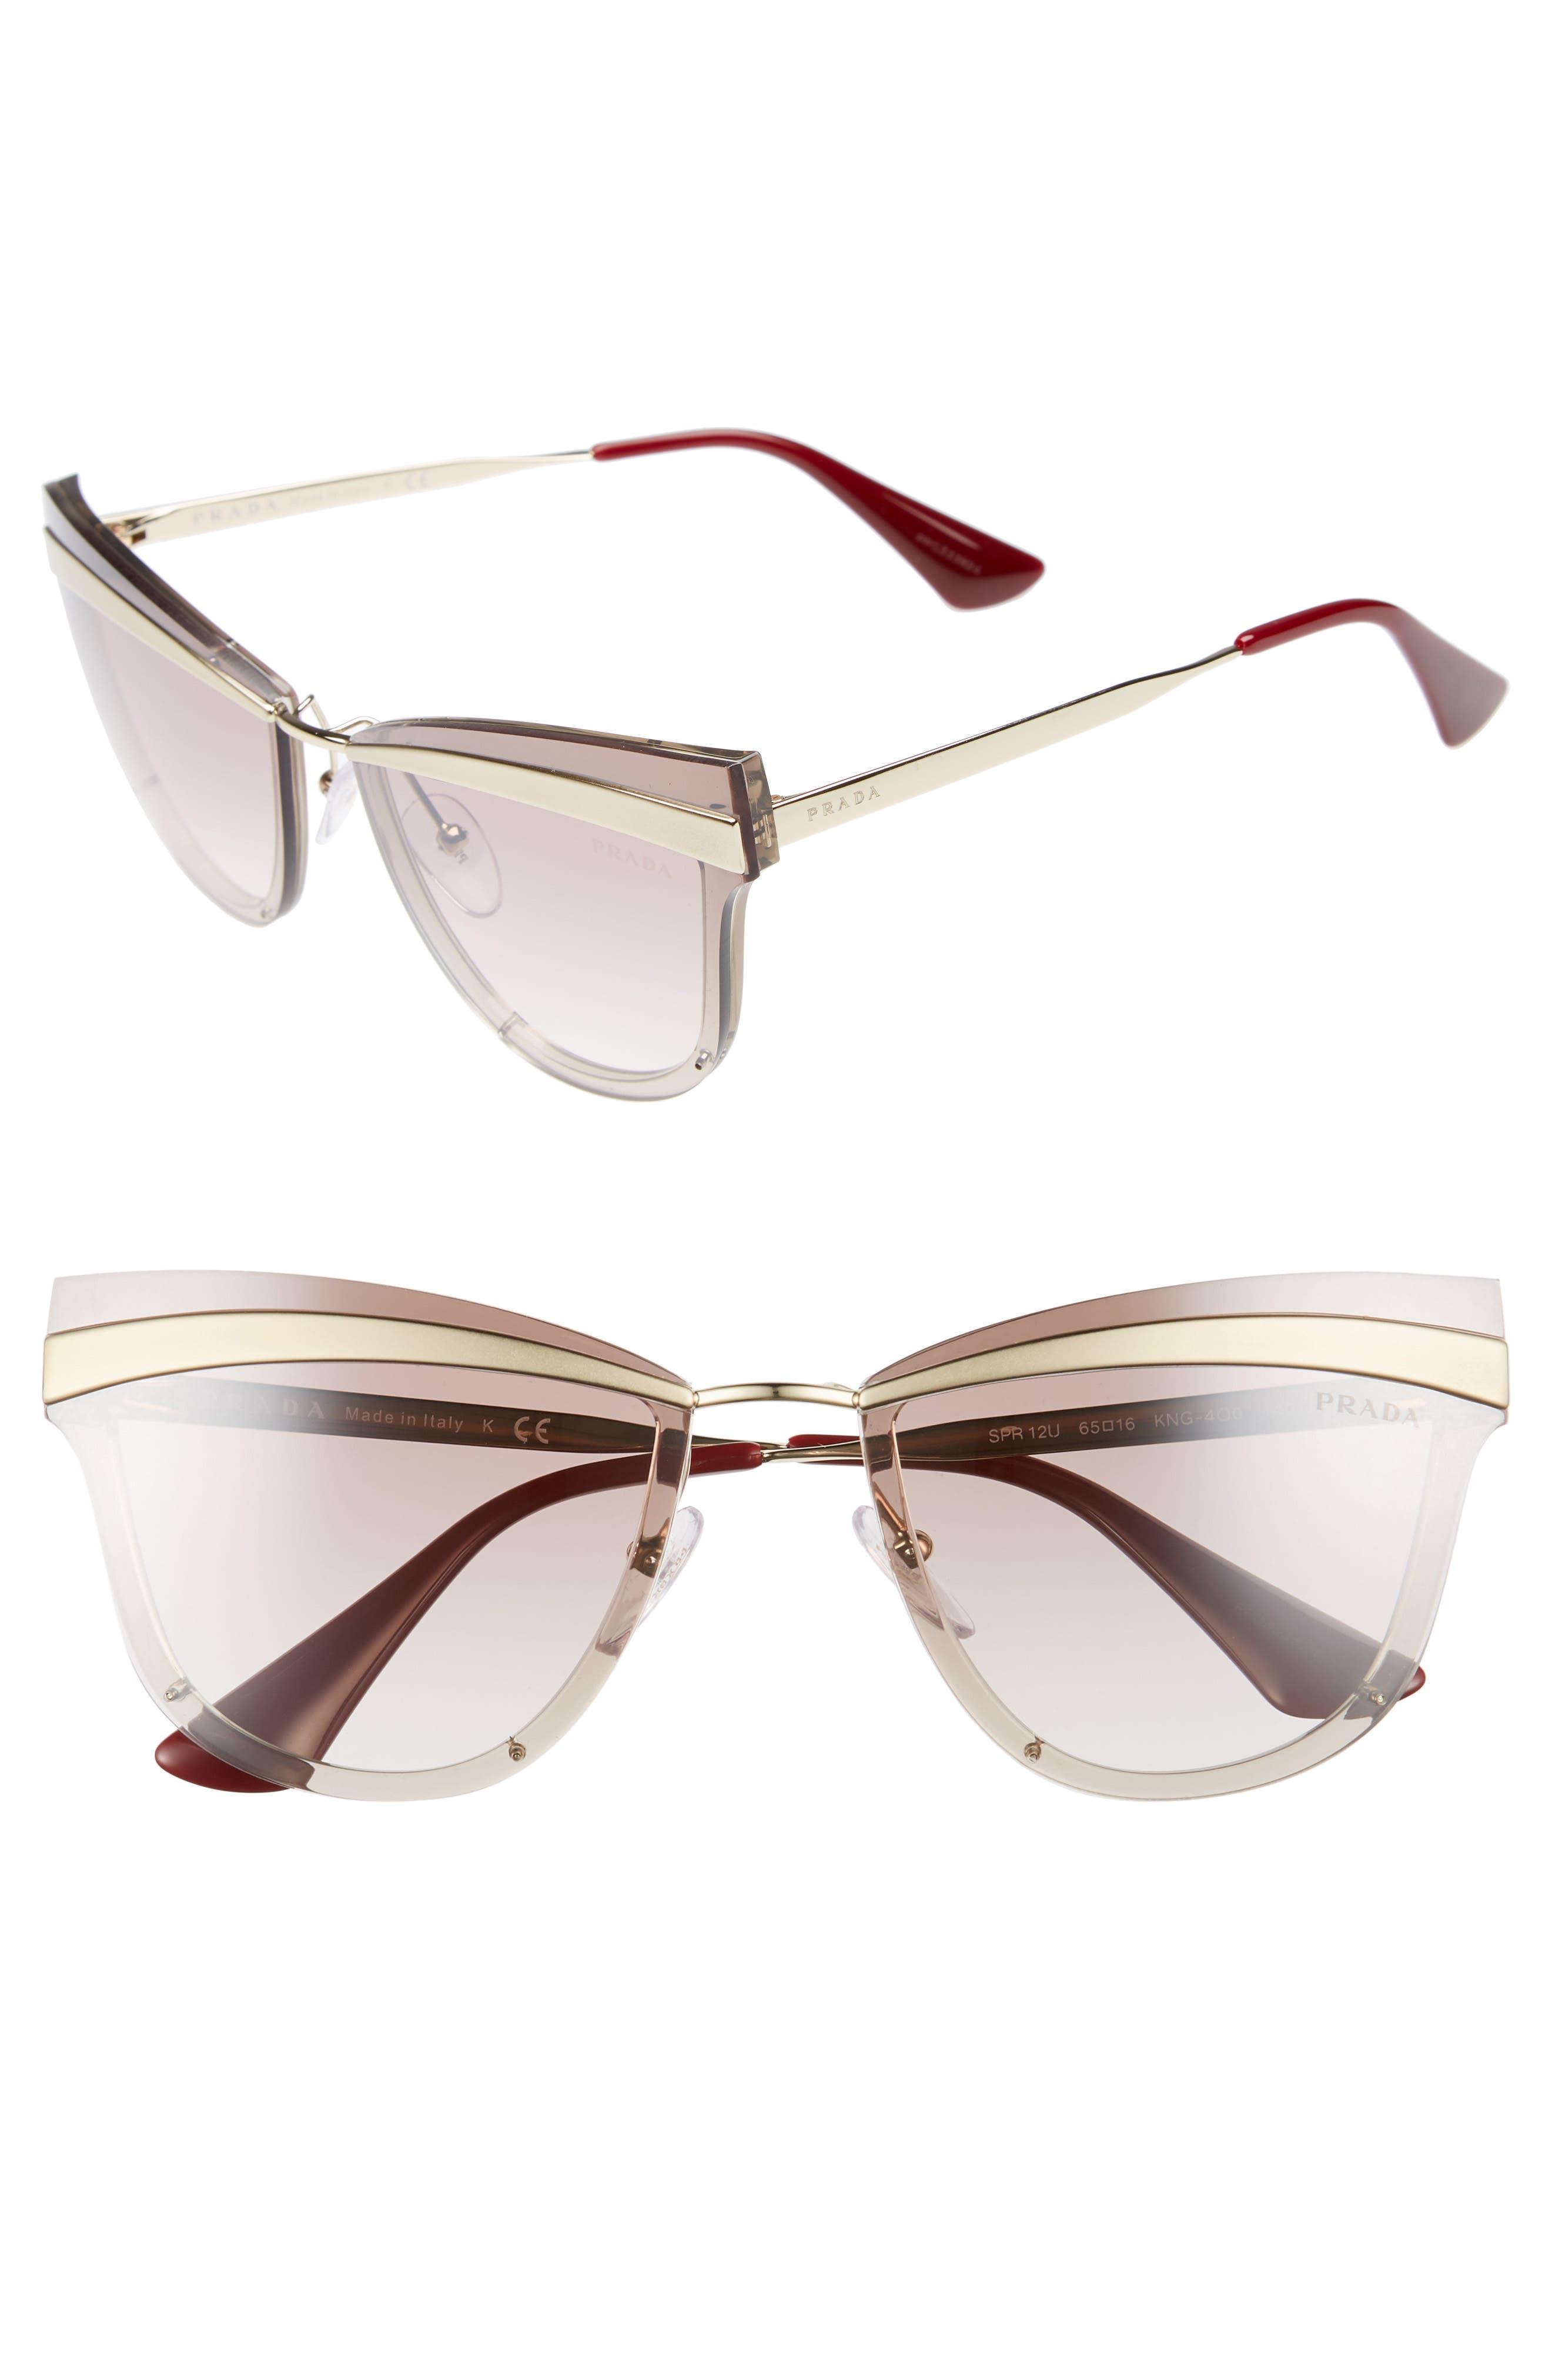 Alternate Image 1 Selected - Prada Cinema Evolution 65mm Cat Eye Sunglasses